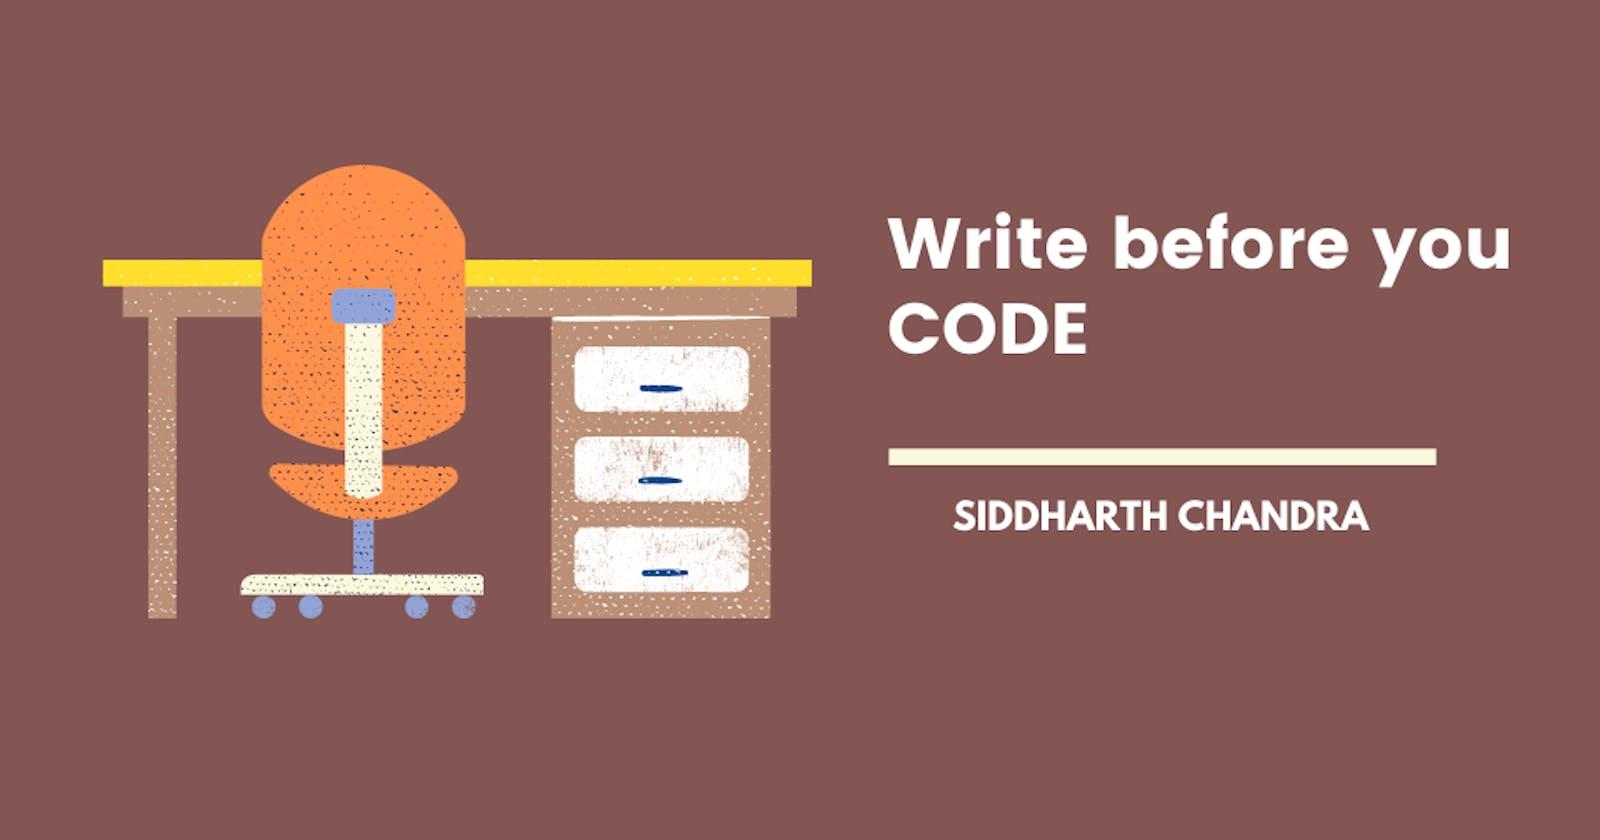 Write before you CODE